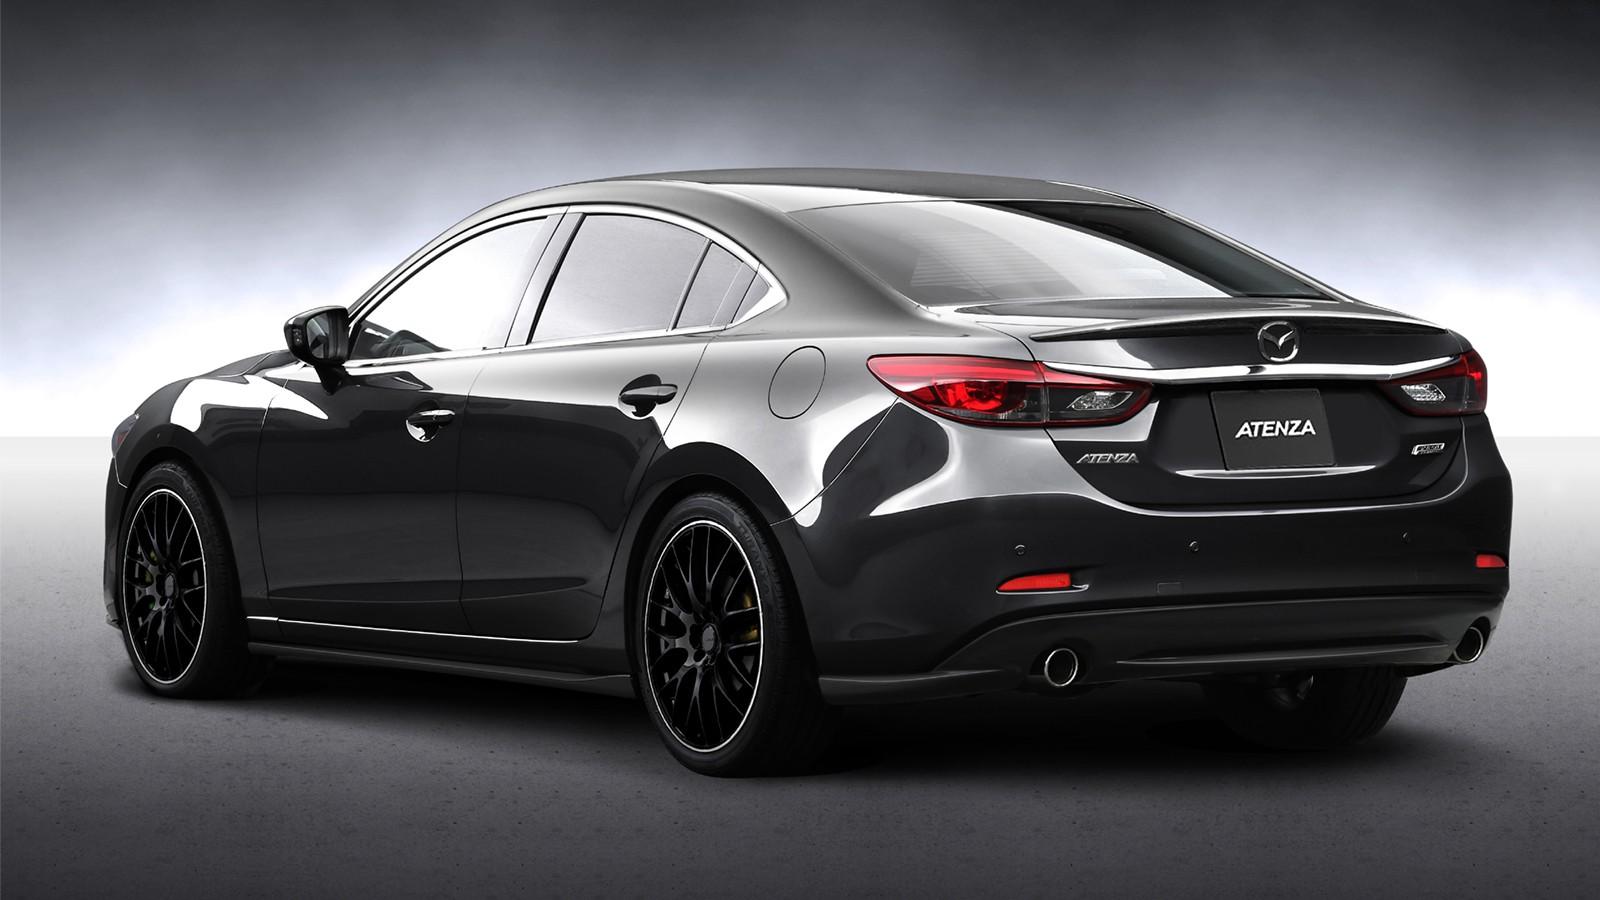 atenza-rear-ts-1512220807024230-1.jpg